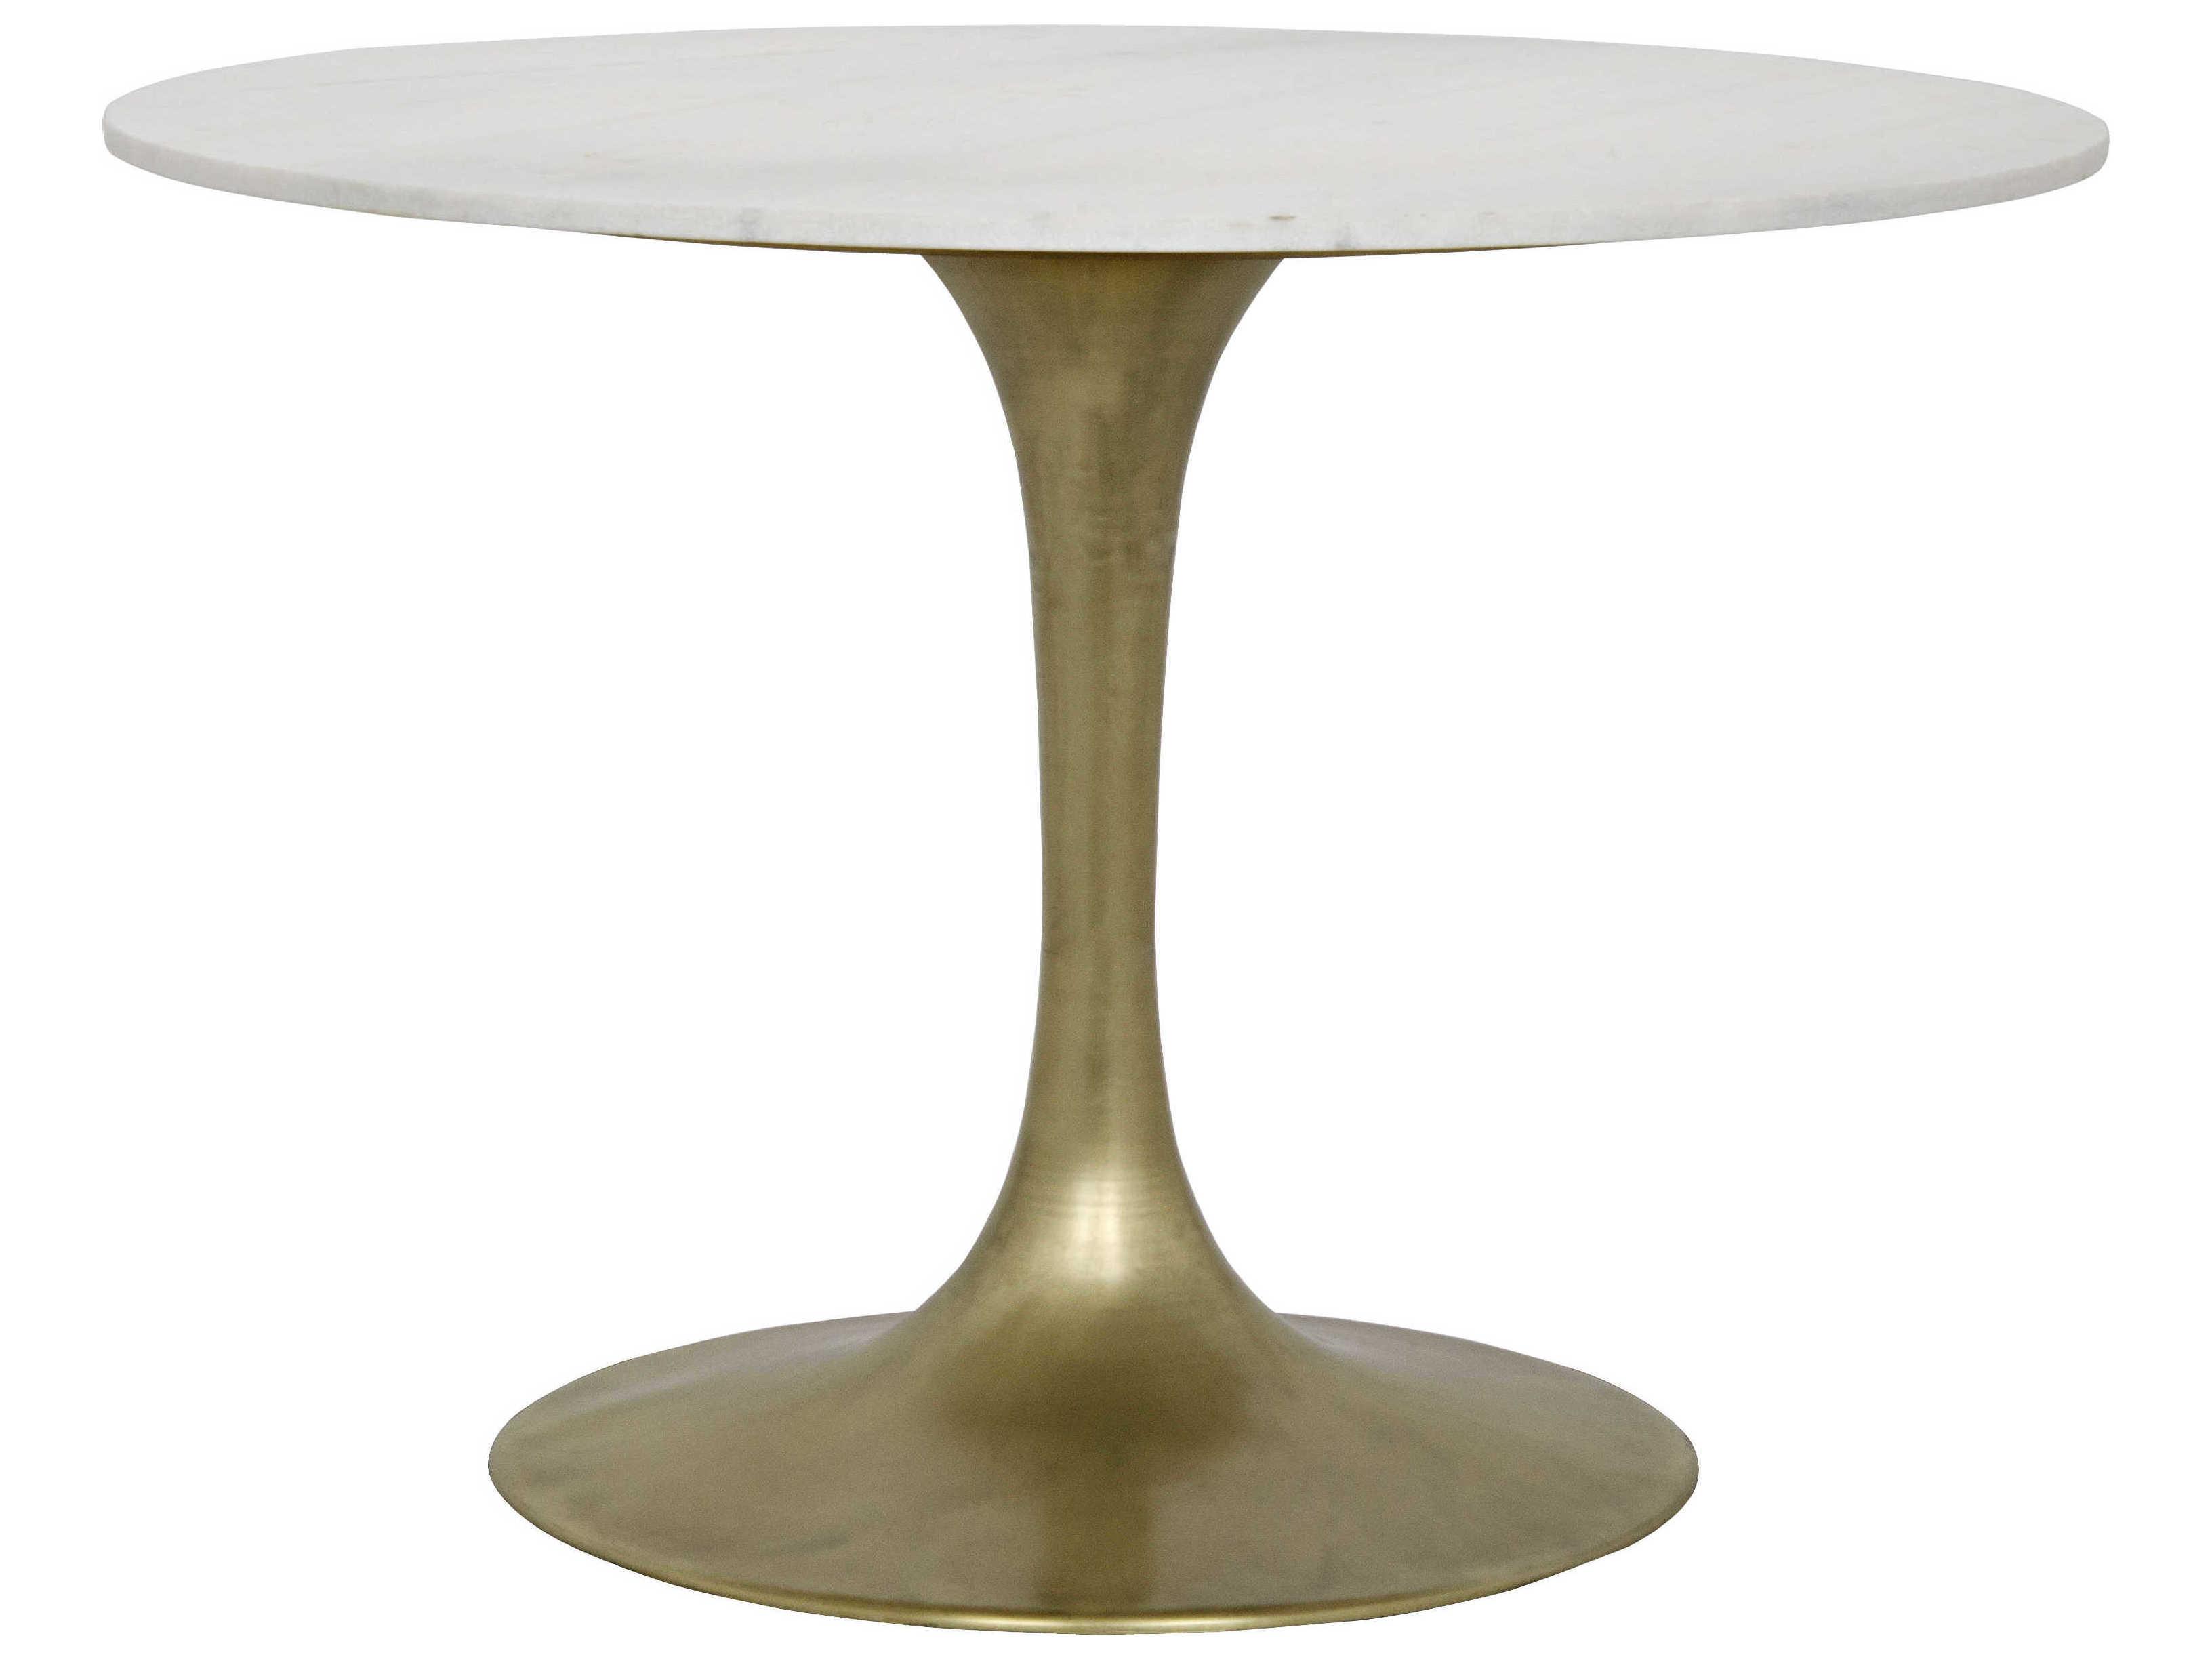 Fabulous Noir Furniture Laredo Antique Brass Marble 40 5 Round Dining Table Machost Co Dining Chair Design Ideas Machostcouk